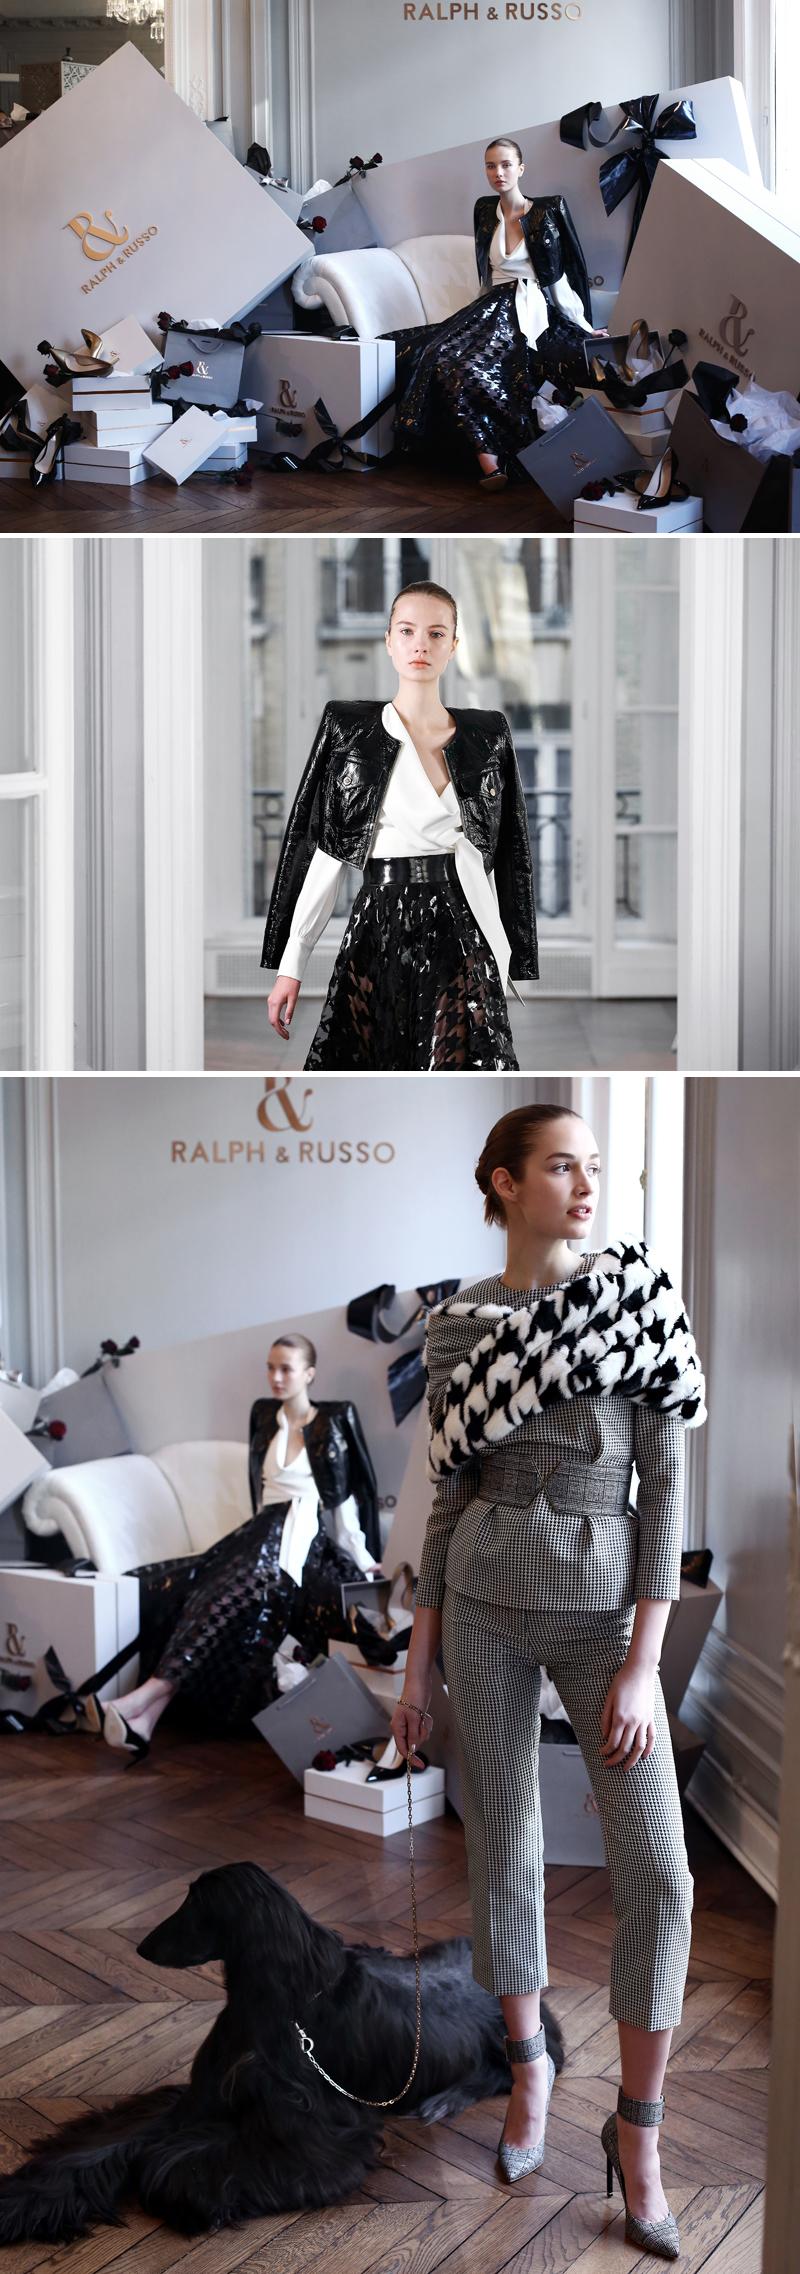 RalphandRusso, Ralph&Russo, Ralph&Russo RTW Fall Winter 2018, R&R Pret a Porter, Perfect Wedding Magazine, Perfect Wedding Blog, Paris Fashion Week